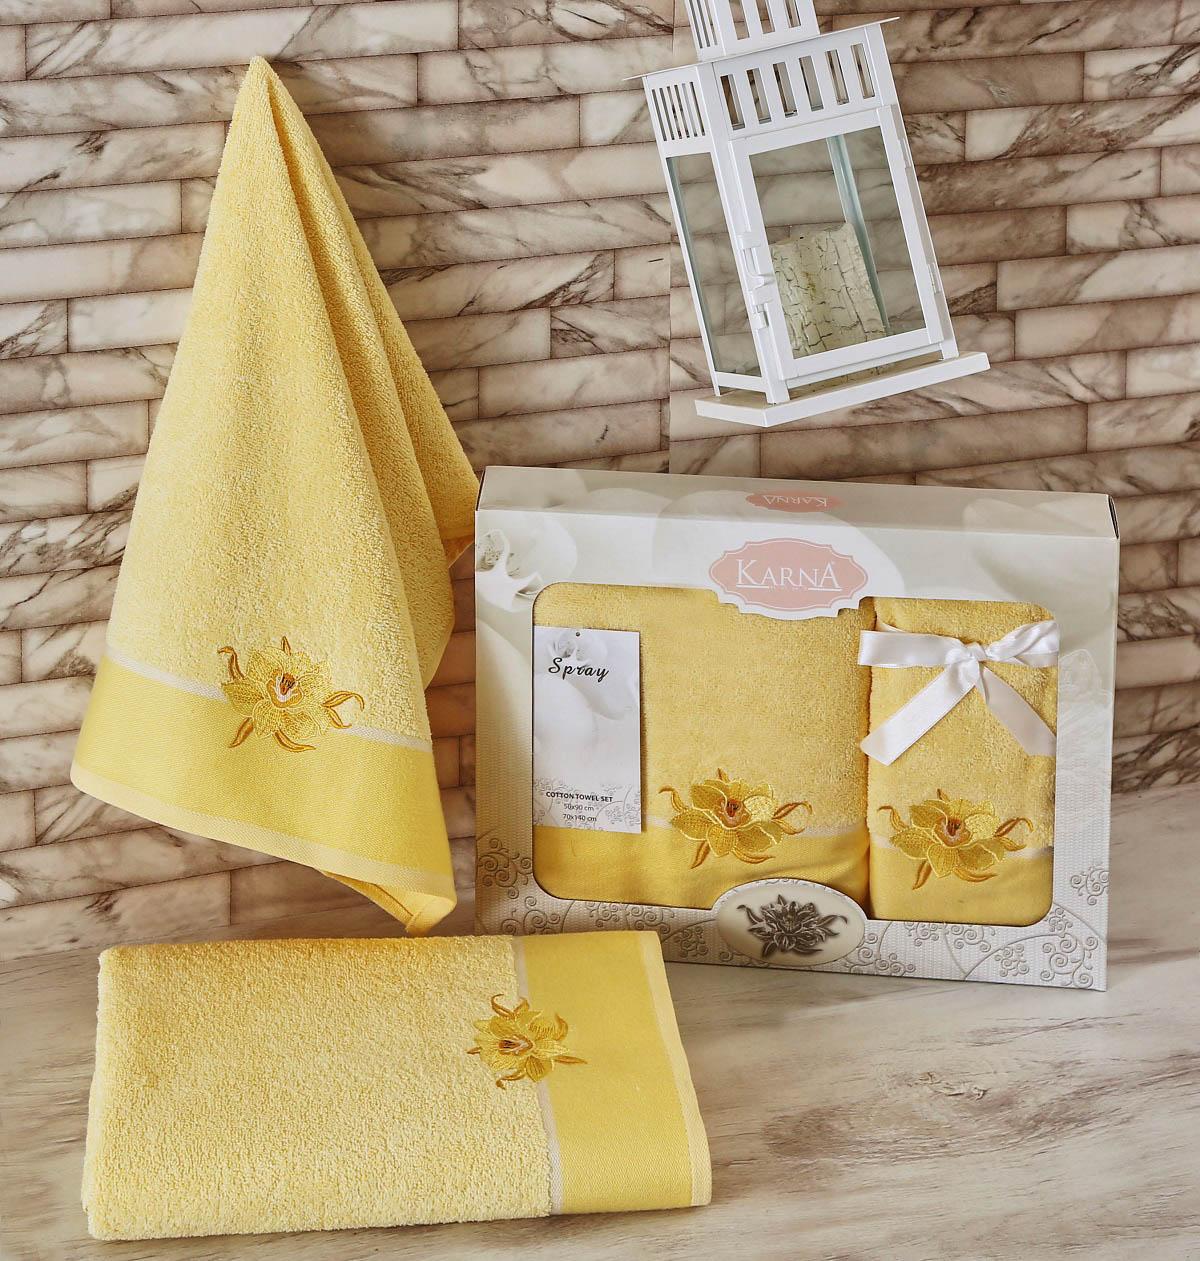 Полотенца Karna Полотенце Spray Цвет: Светло-Желтый (Набор) наматрасник karna с пропиткой 120x200 см